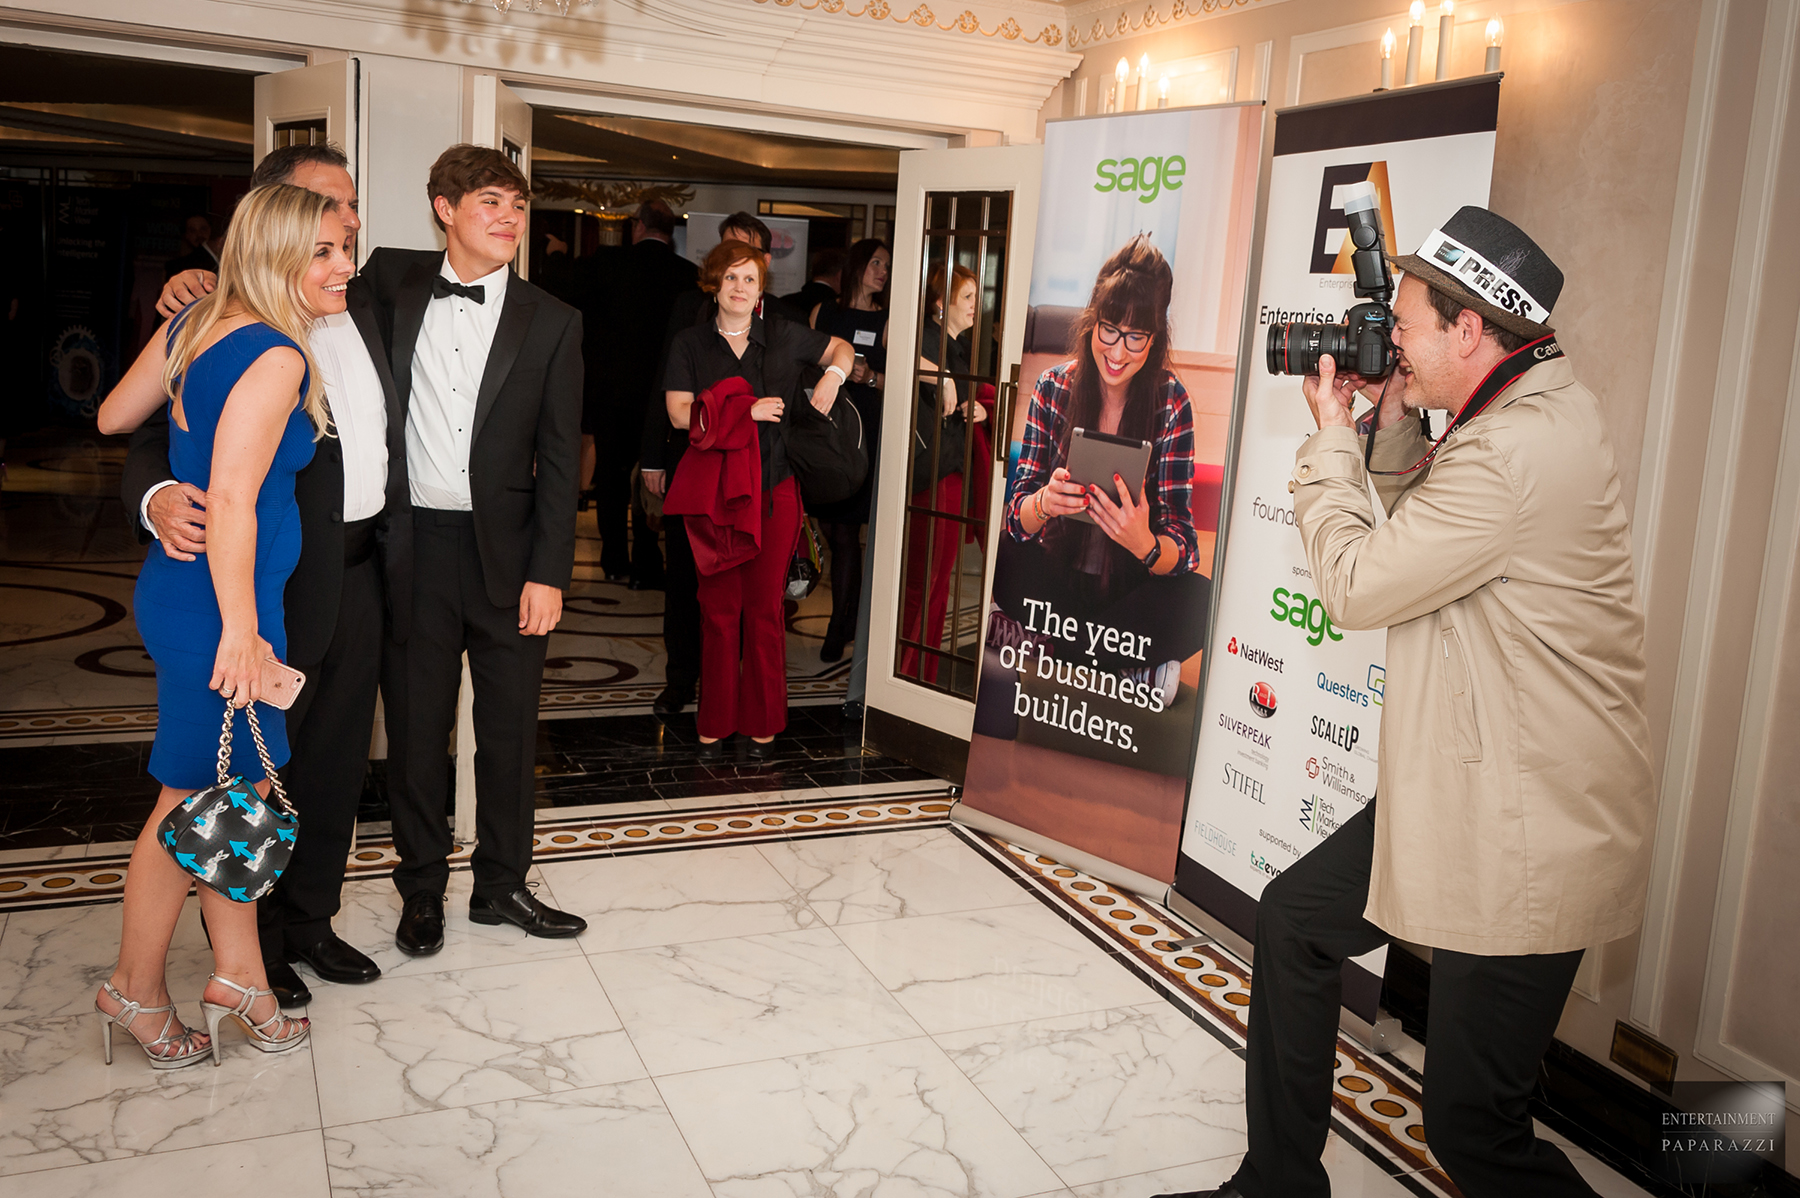 Promo Paparazzi Entertainers Event Paparazzi London